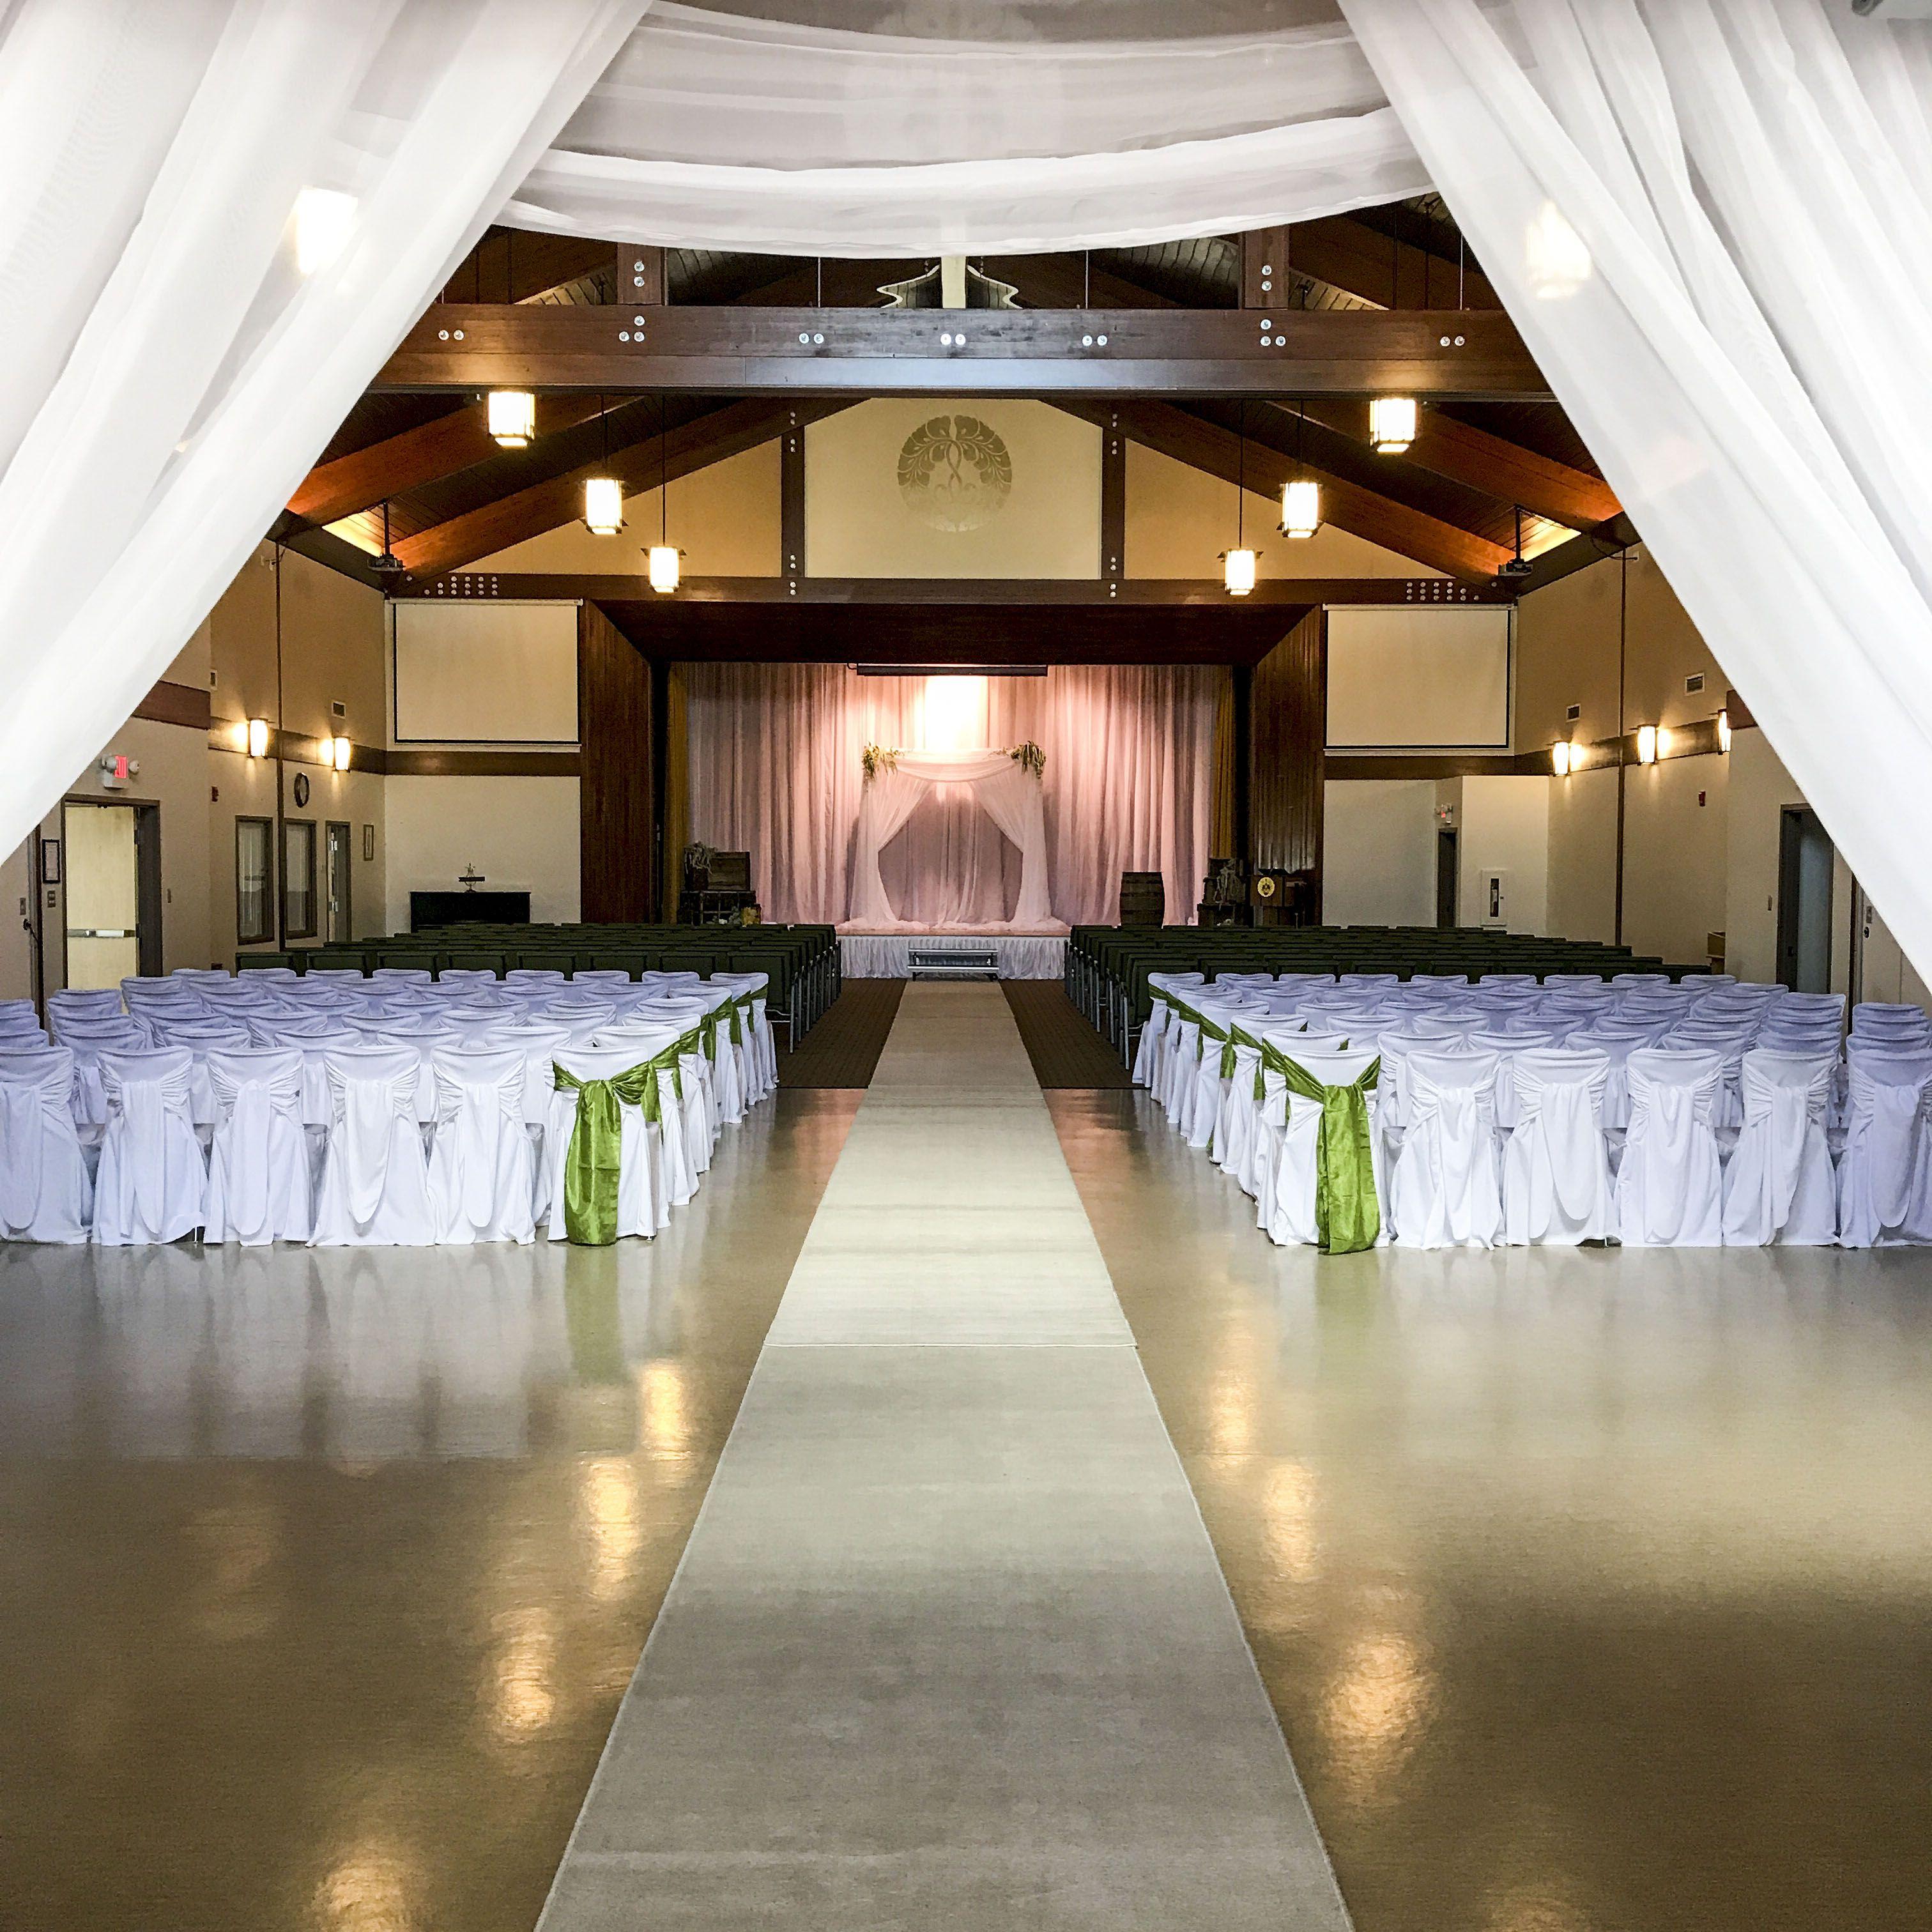 Wedding reception simple stage decoration  Wedding Ceremony at the Buddhist Temple lachefs lachefsdecor